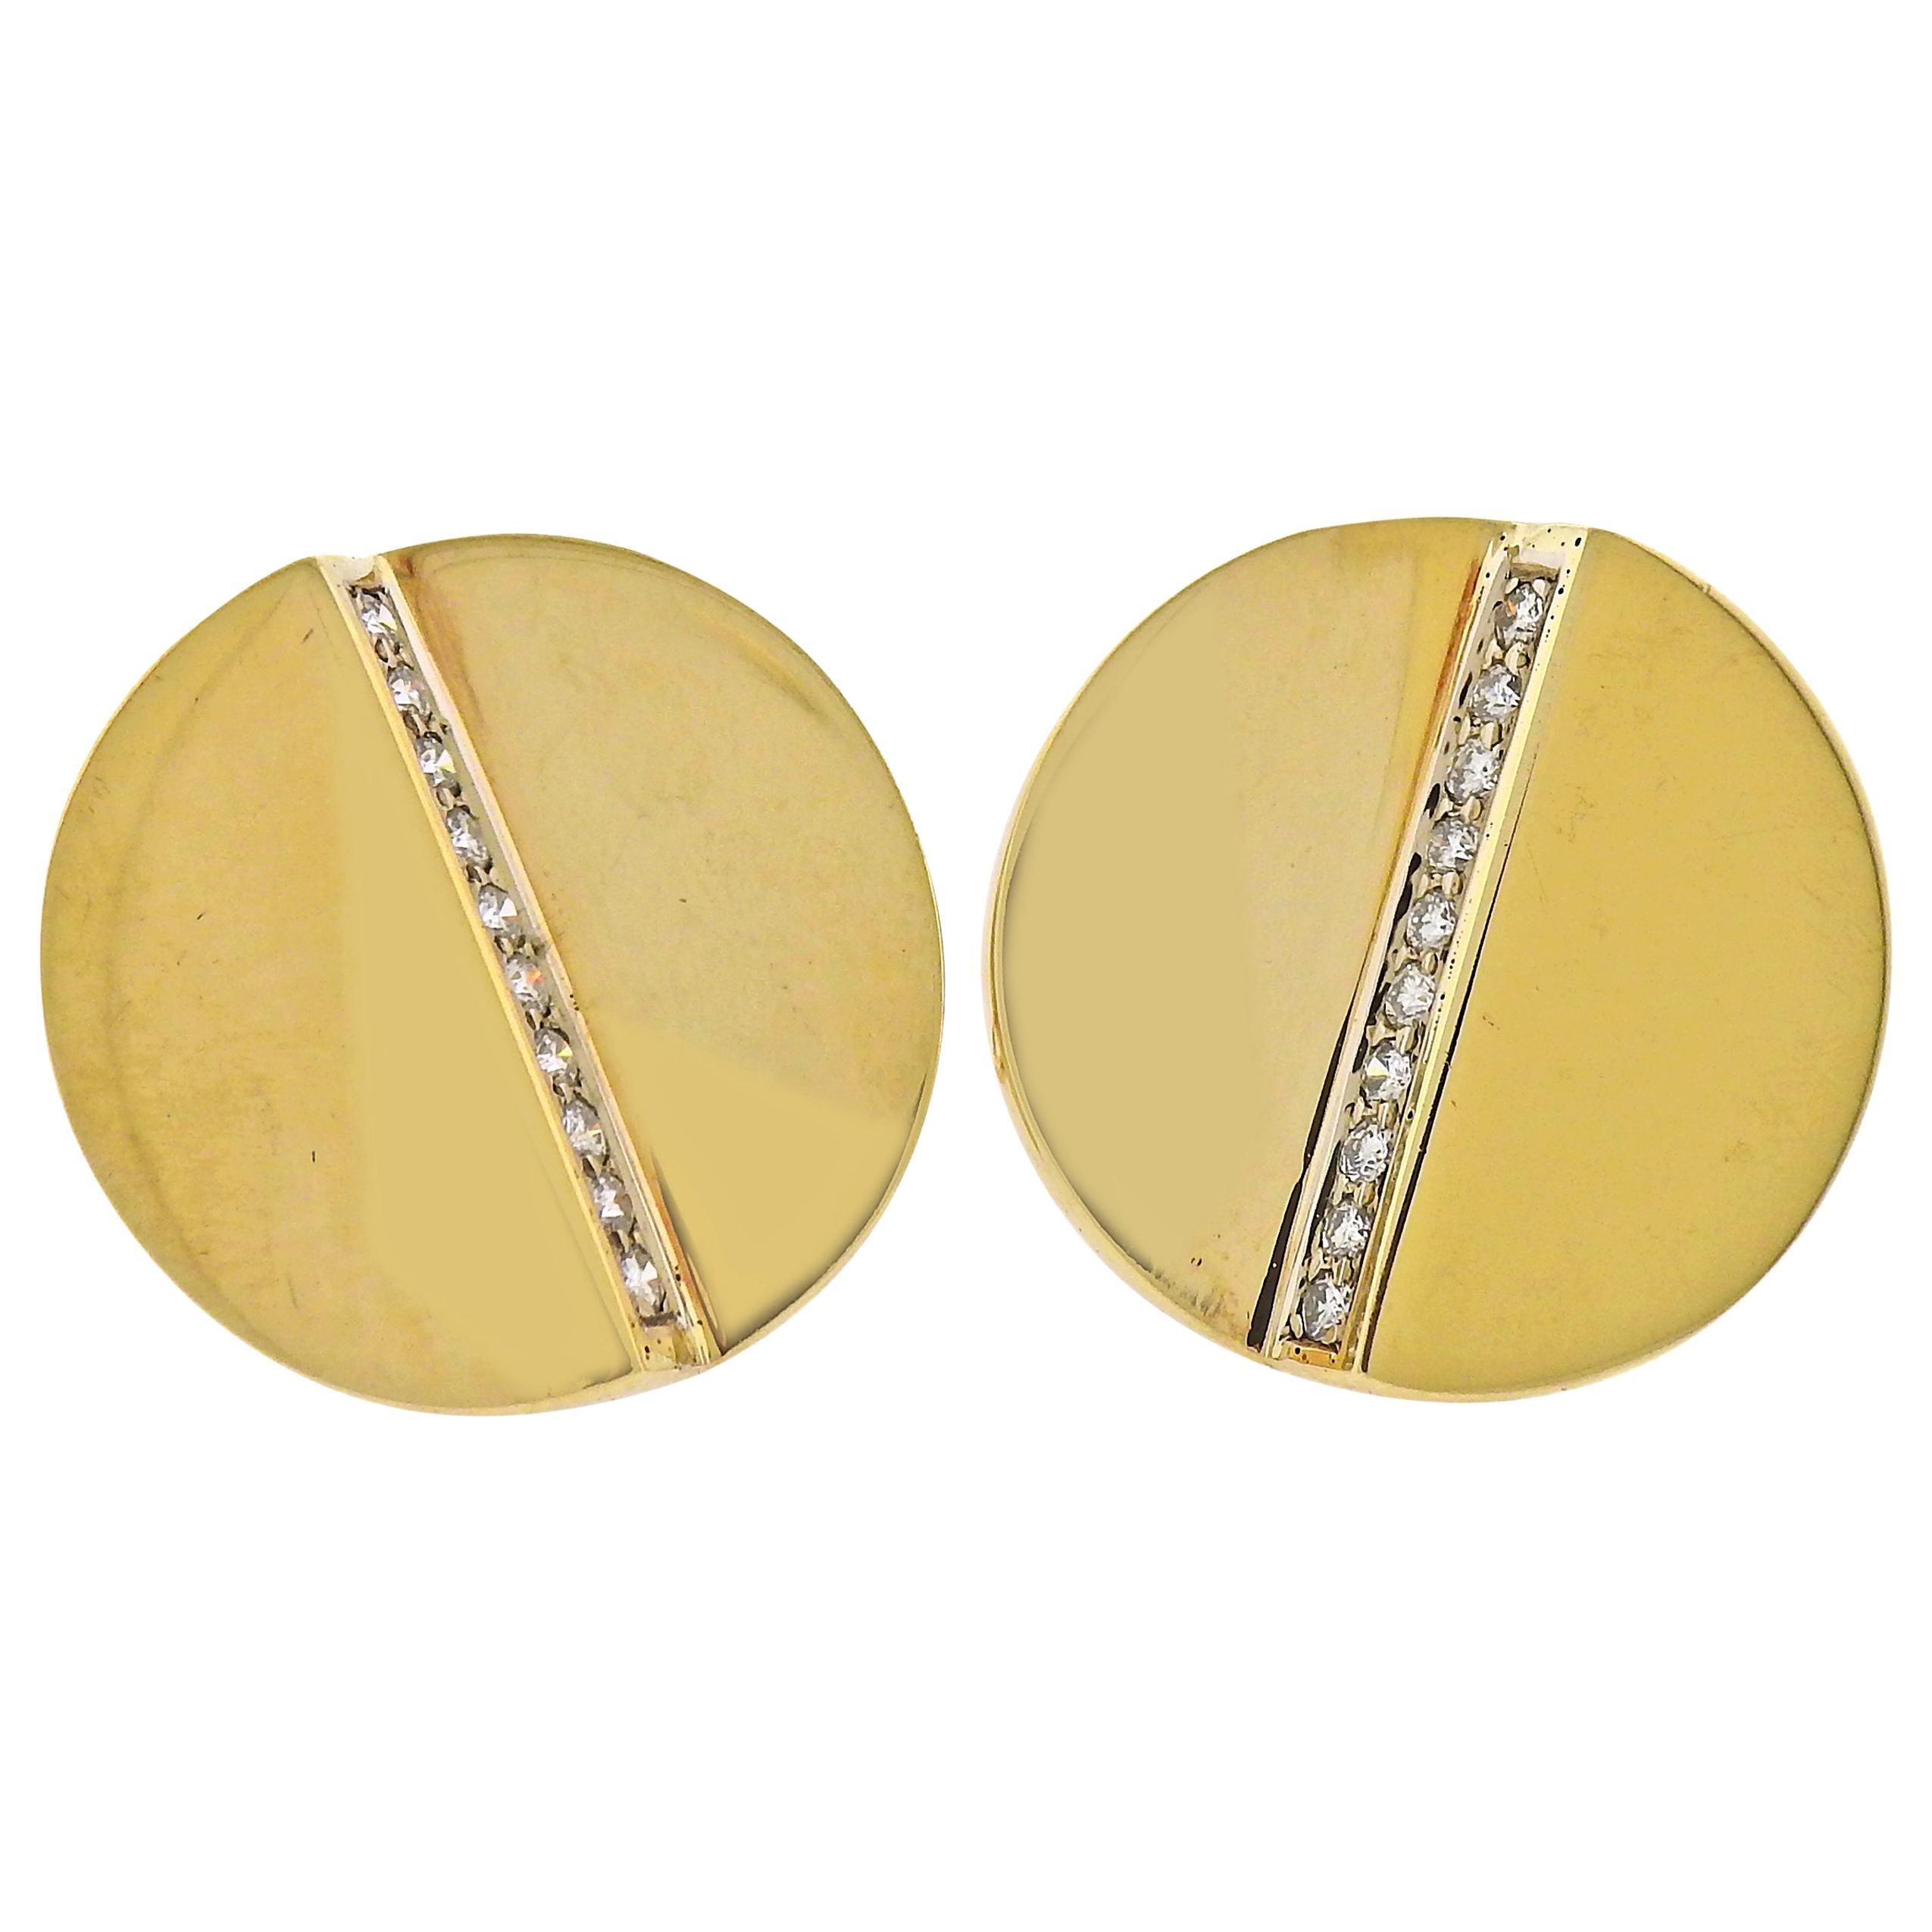 Aldo Cipullo 1970s Diamond Gold Earrings